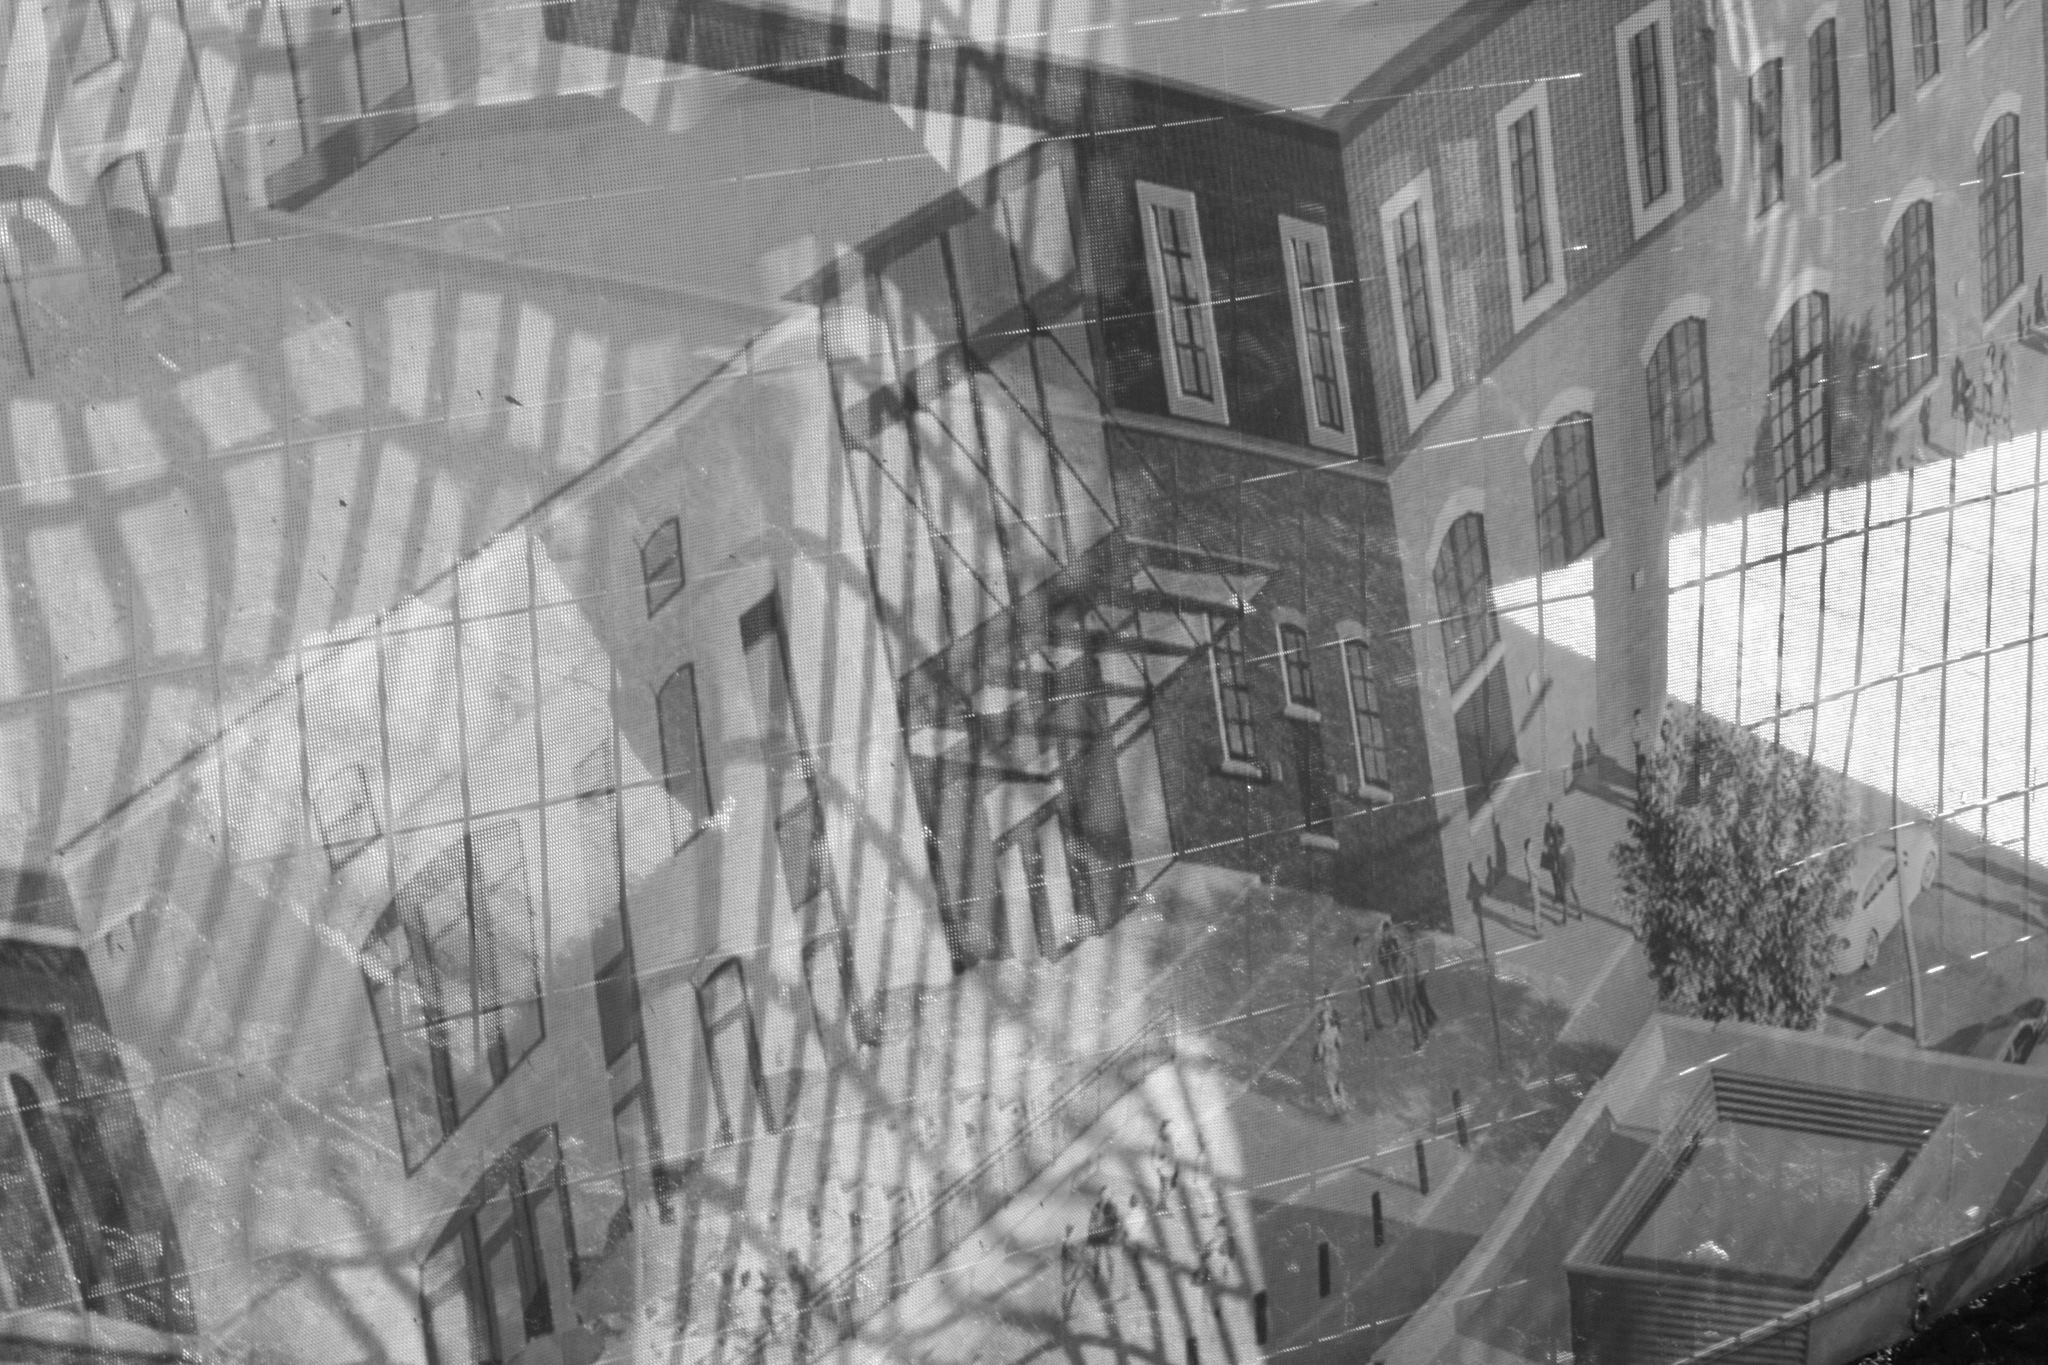 Dreams of MC  Escher by JeffreyJames